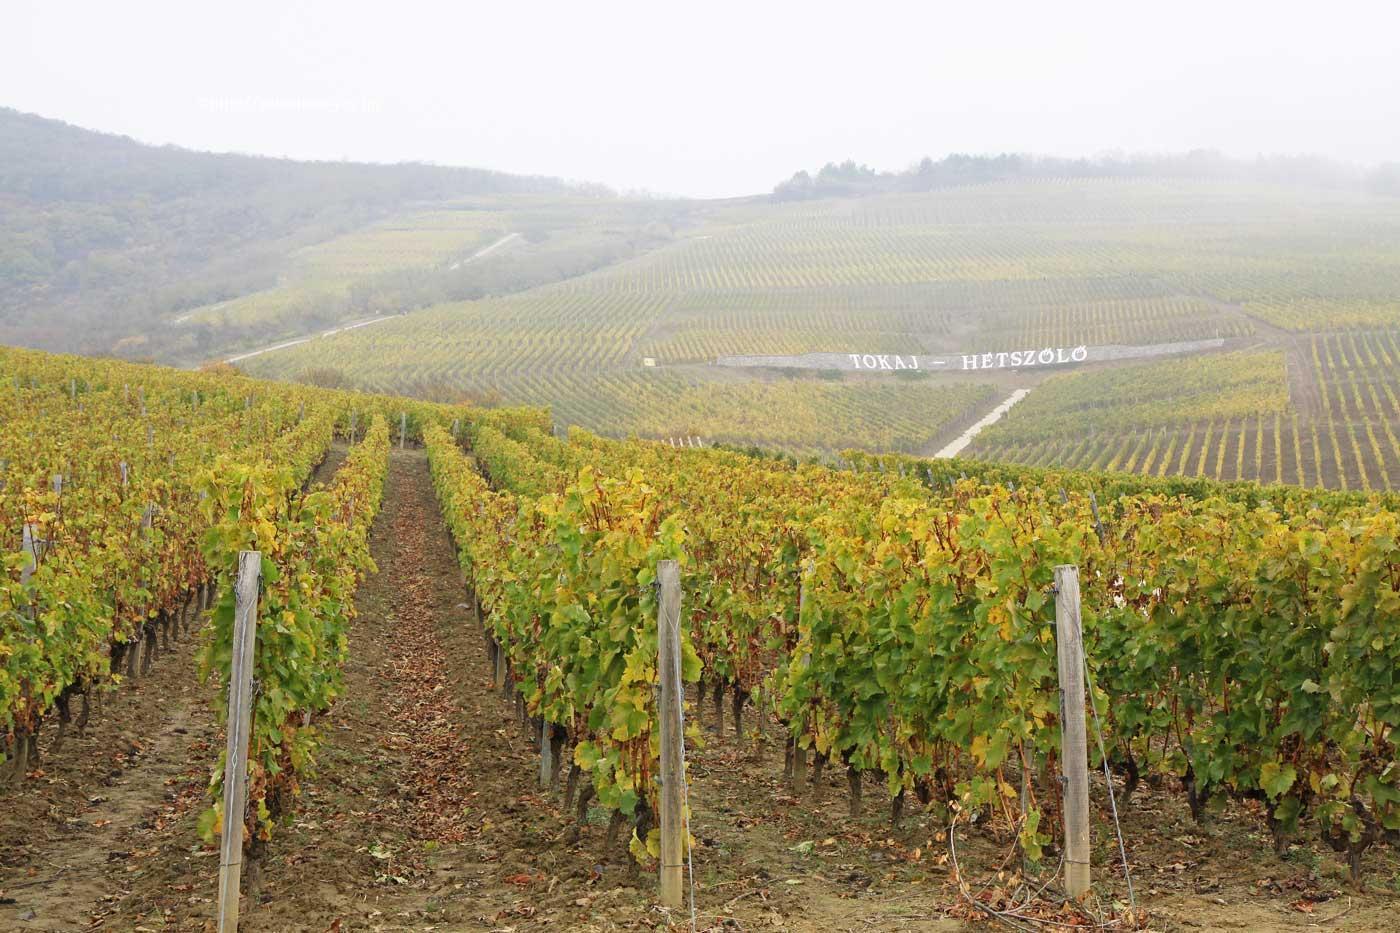 NHKラジオ第1マイあさ!9月はハンガリーの世界遺産「トカイワイン産地の歴史的文化的景観」をご紹介